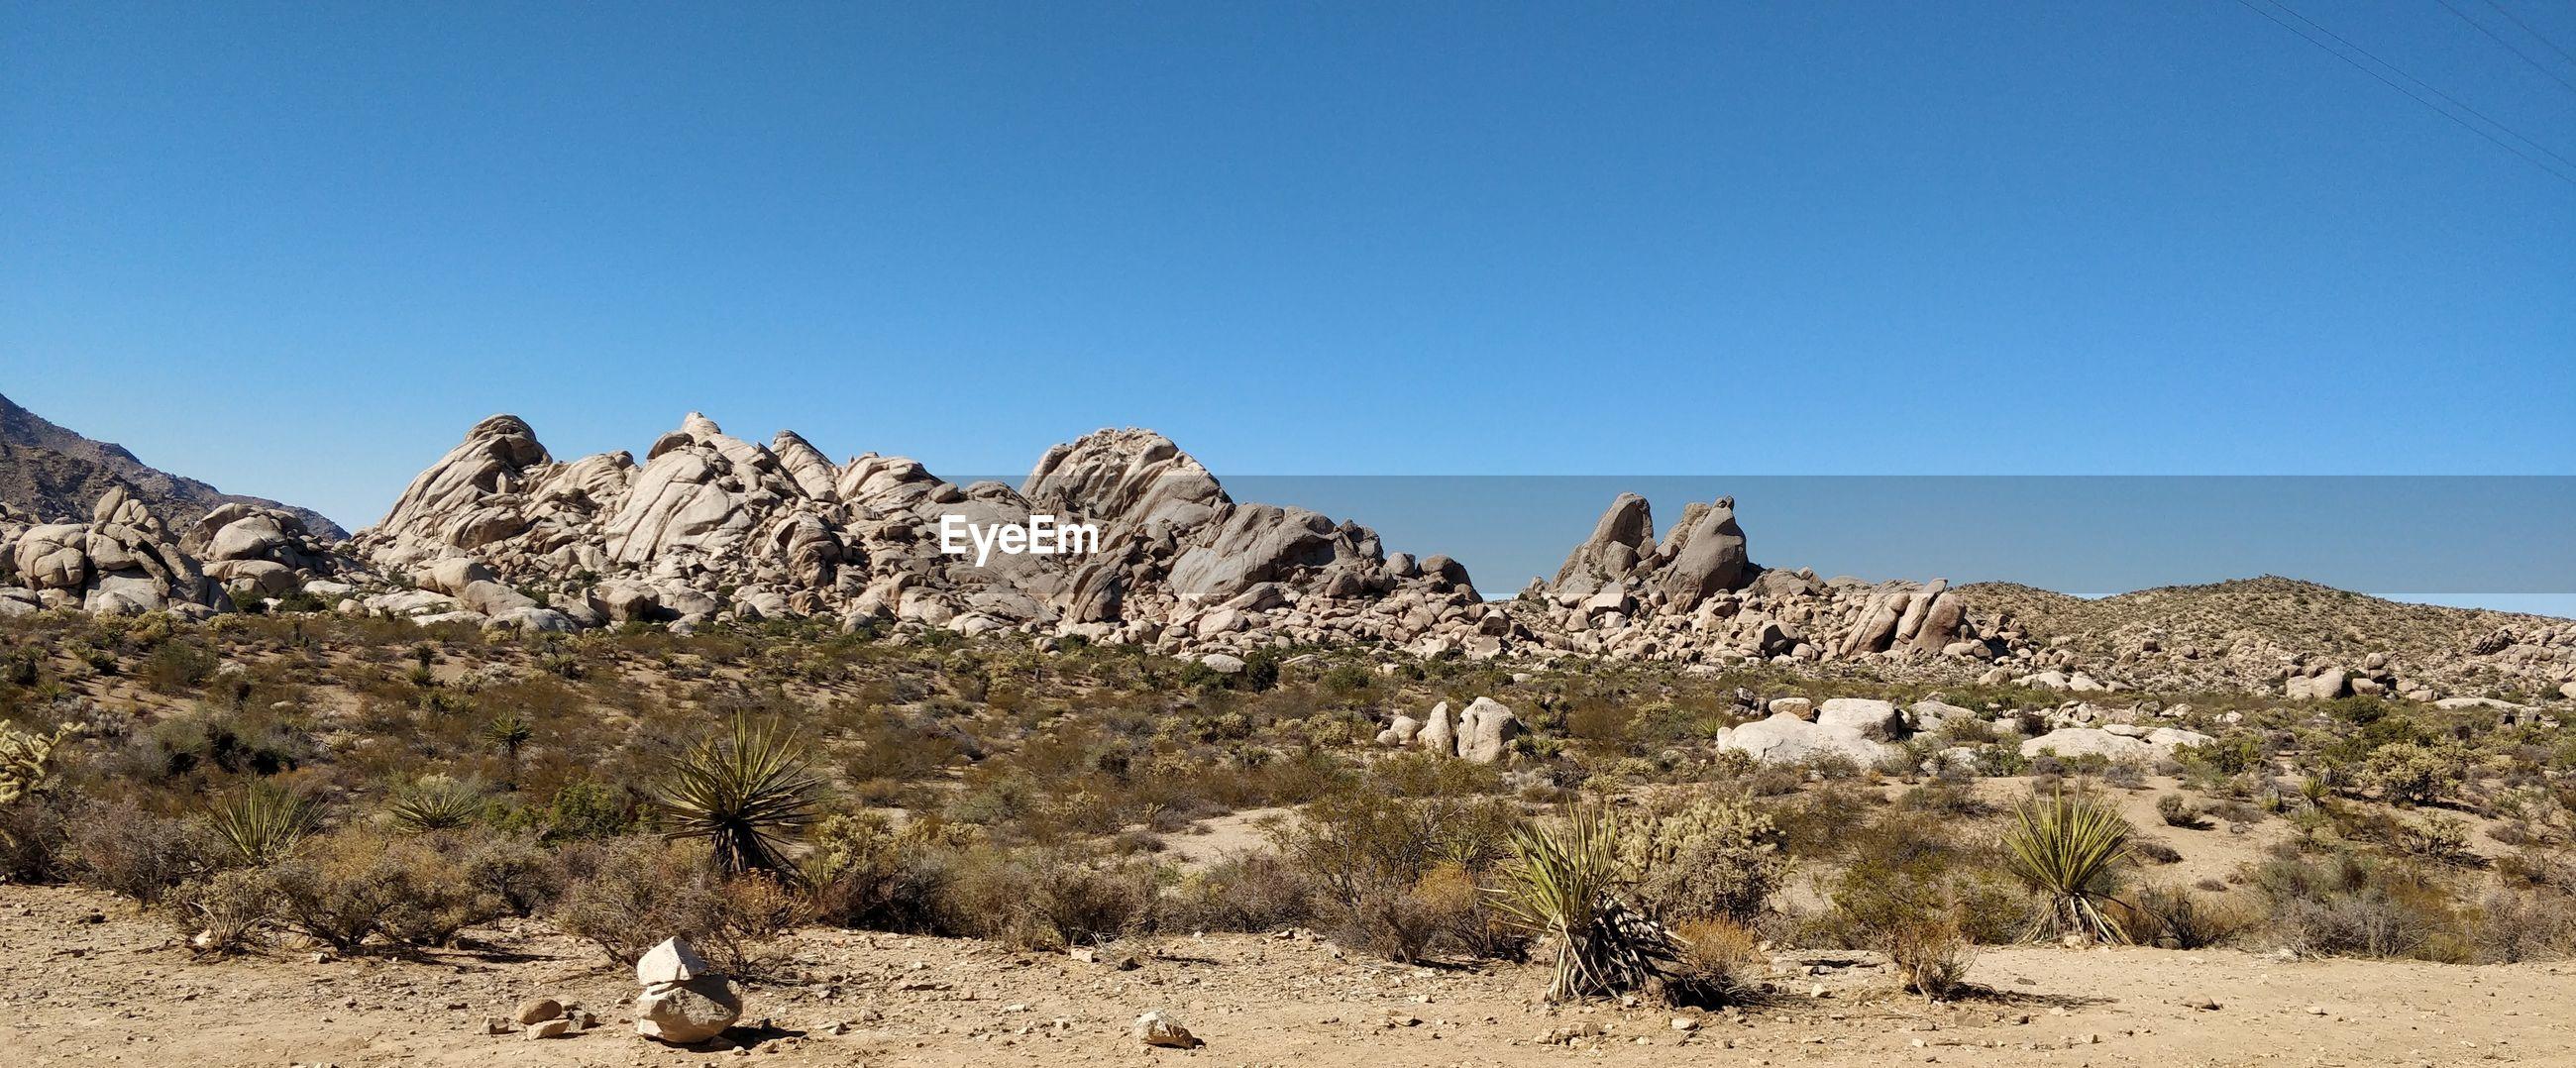 VIEW OF PLANTS IN DESERT